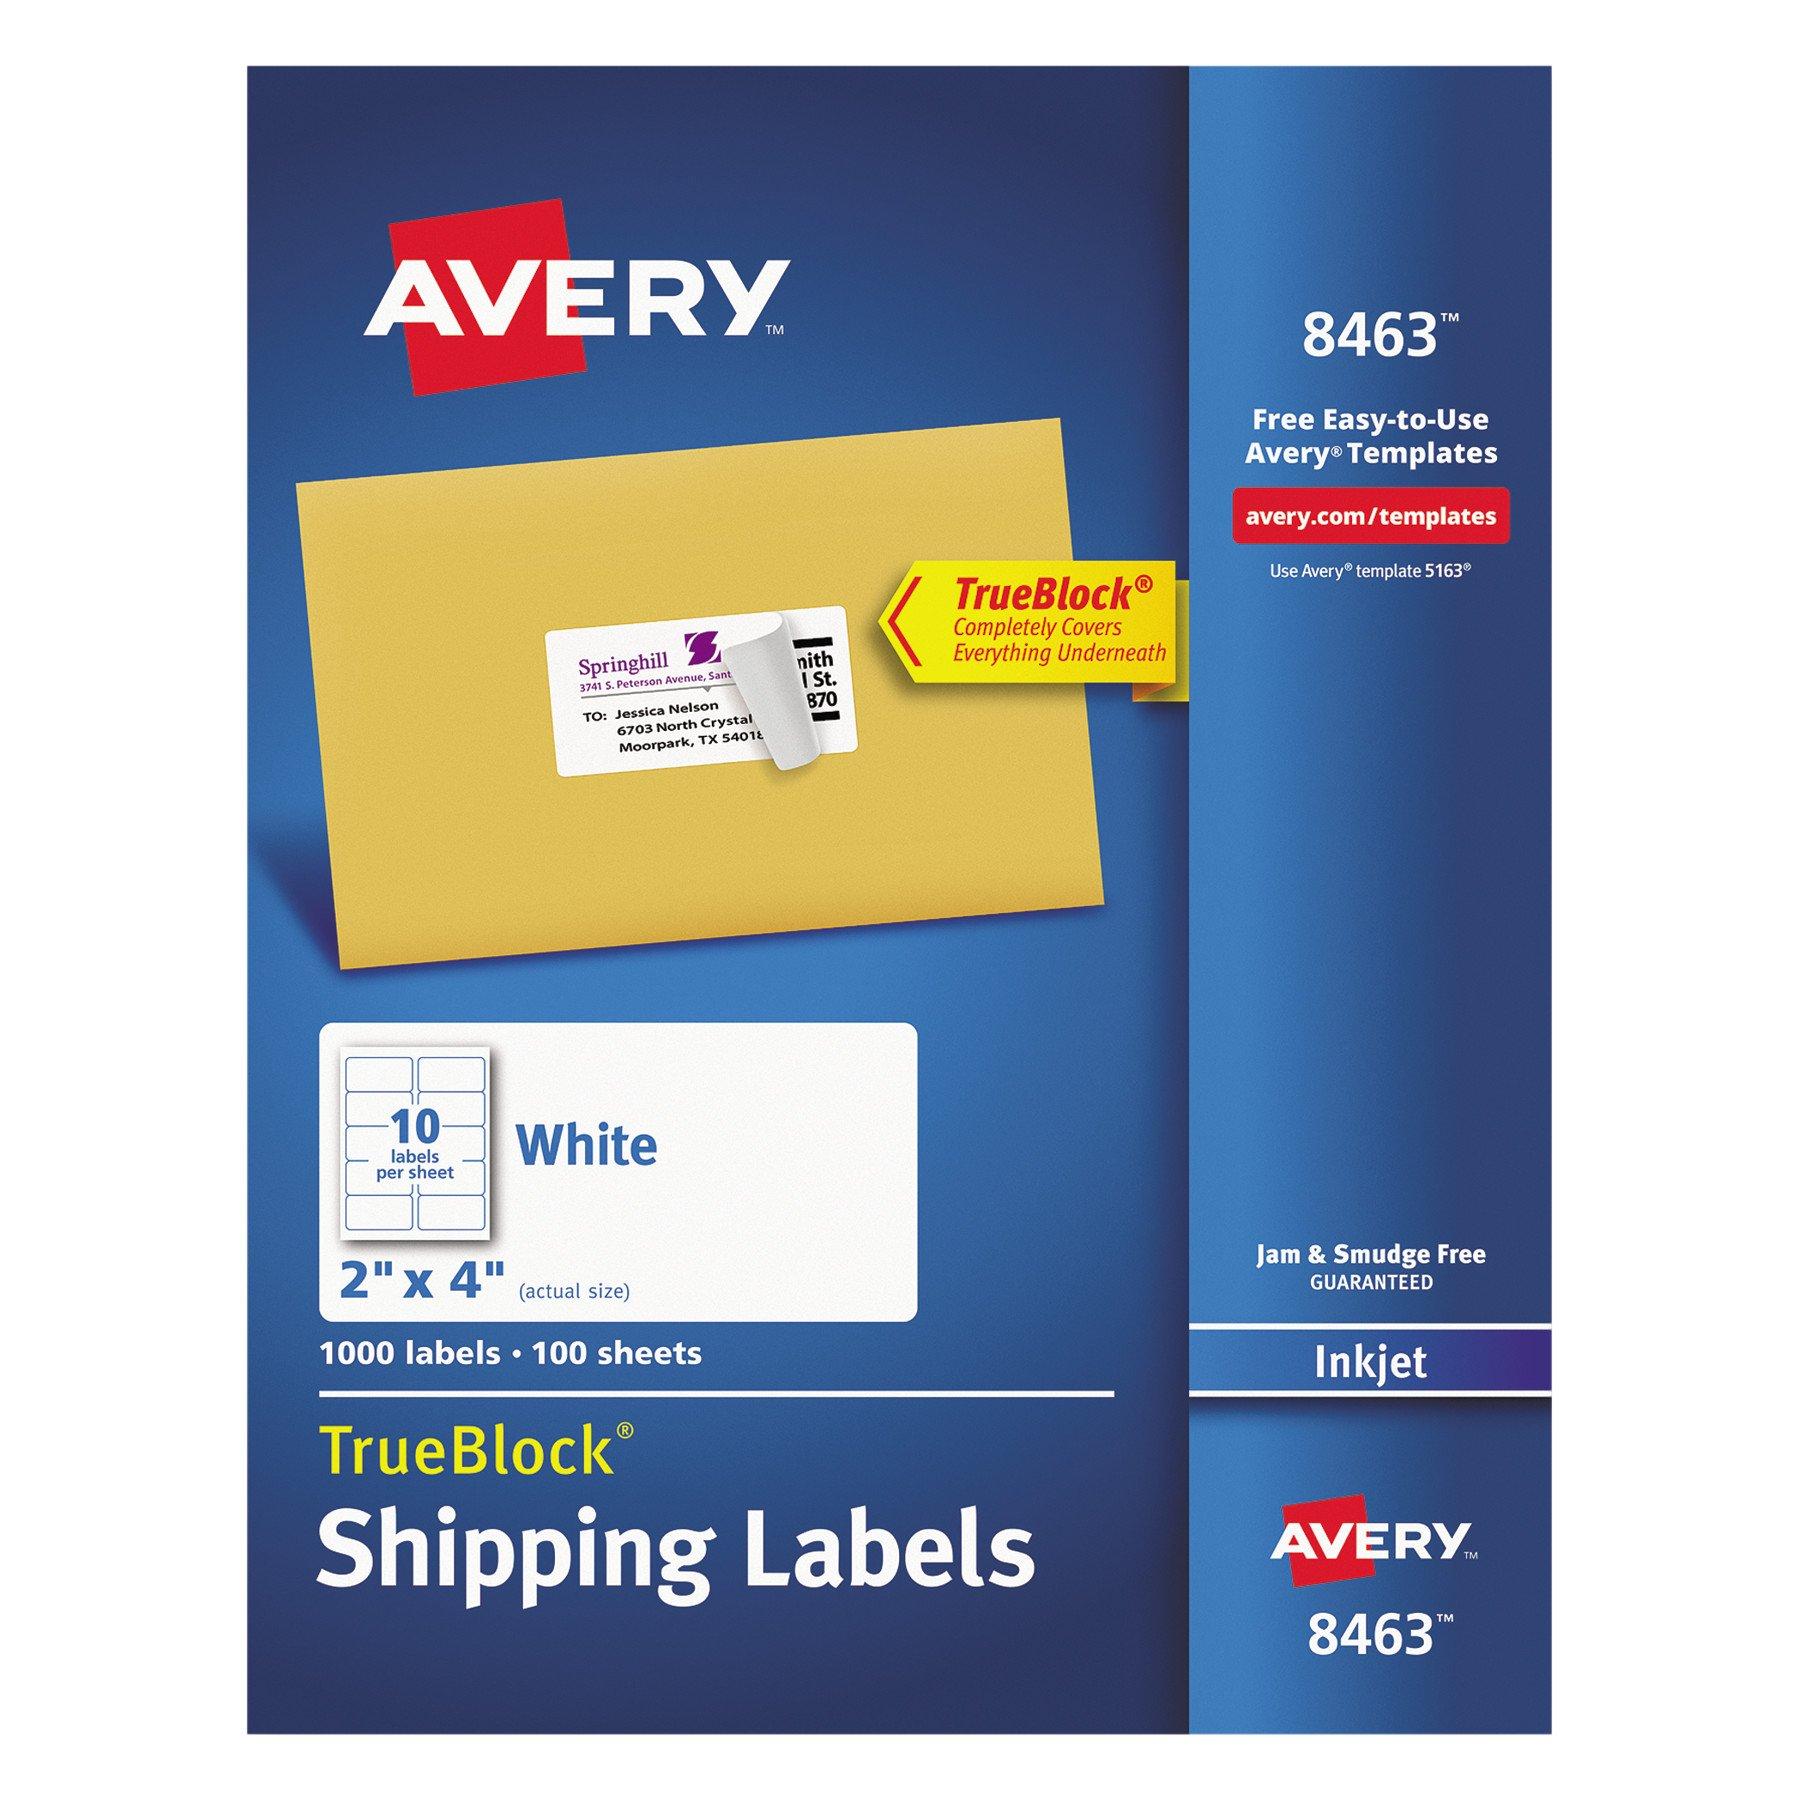 Avery Shipping Address Labels, Inkjet Printers, 1,000 Labels, 2x4 Labels, Permanent Adhesive, TrueBlock (8463)